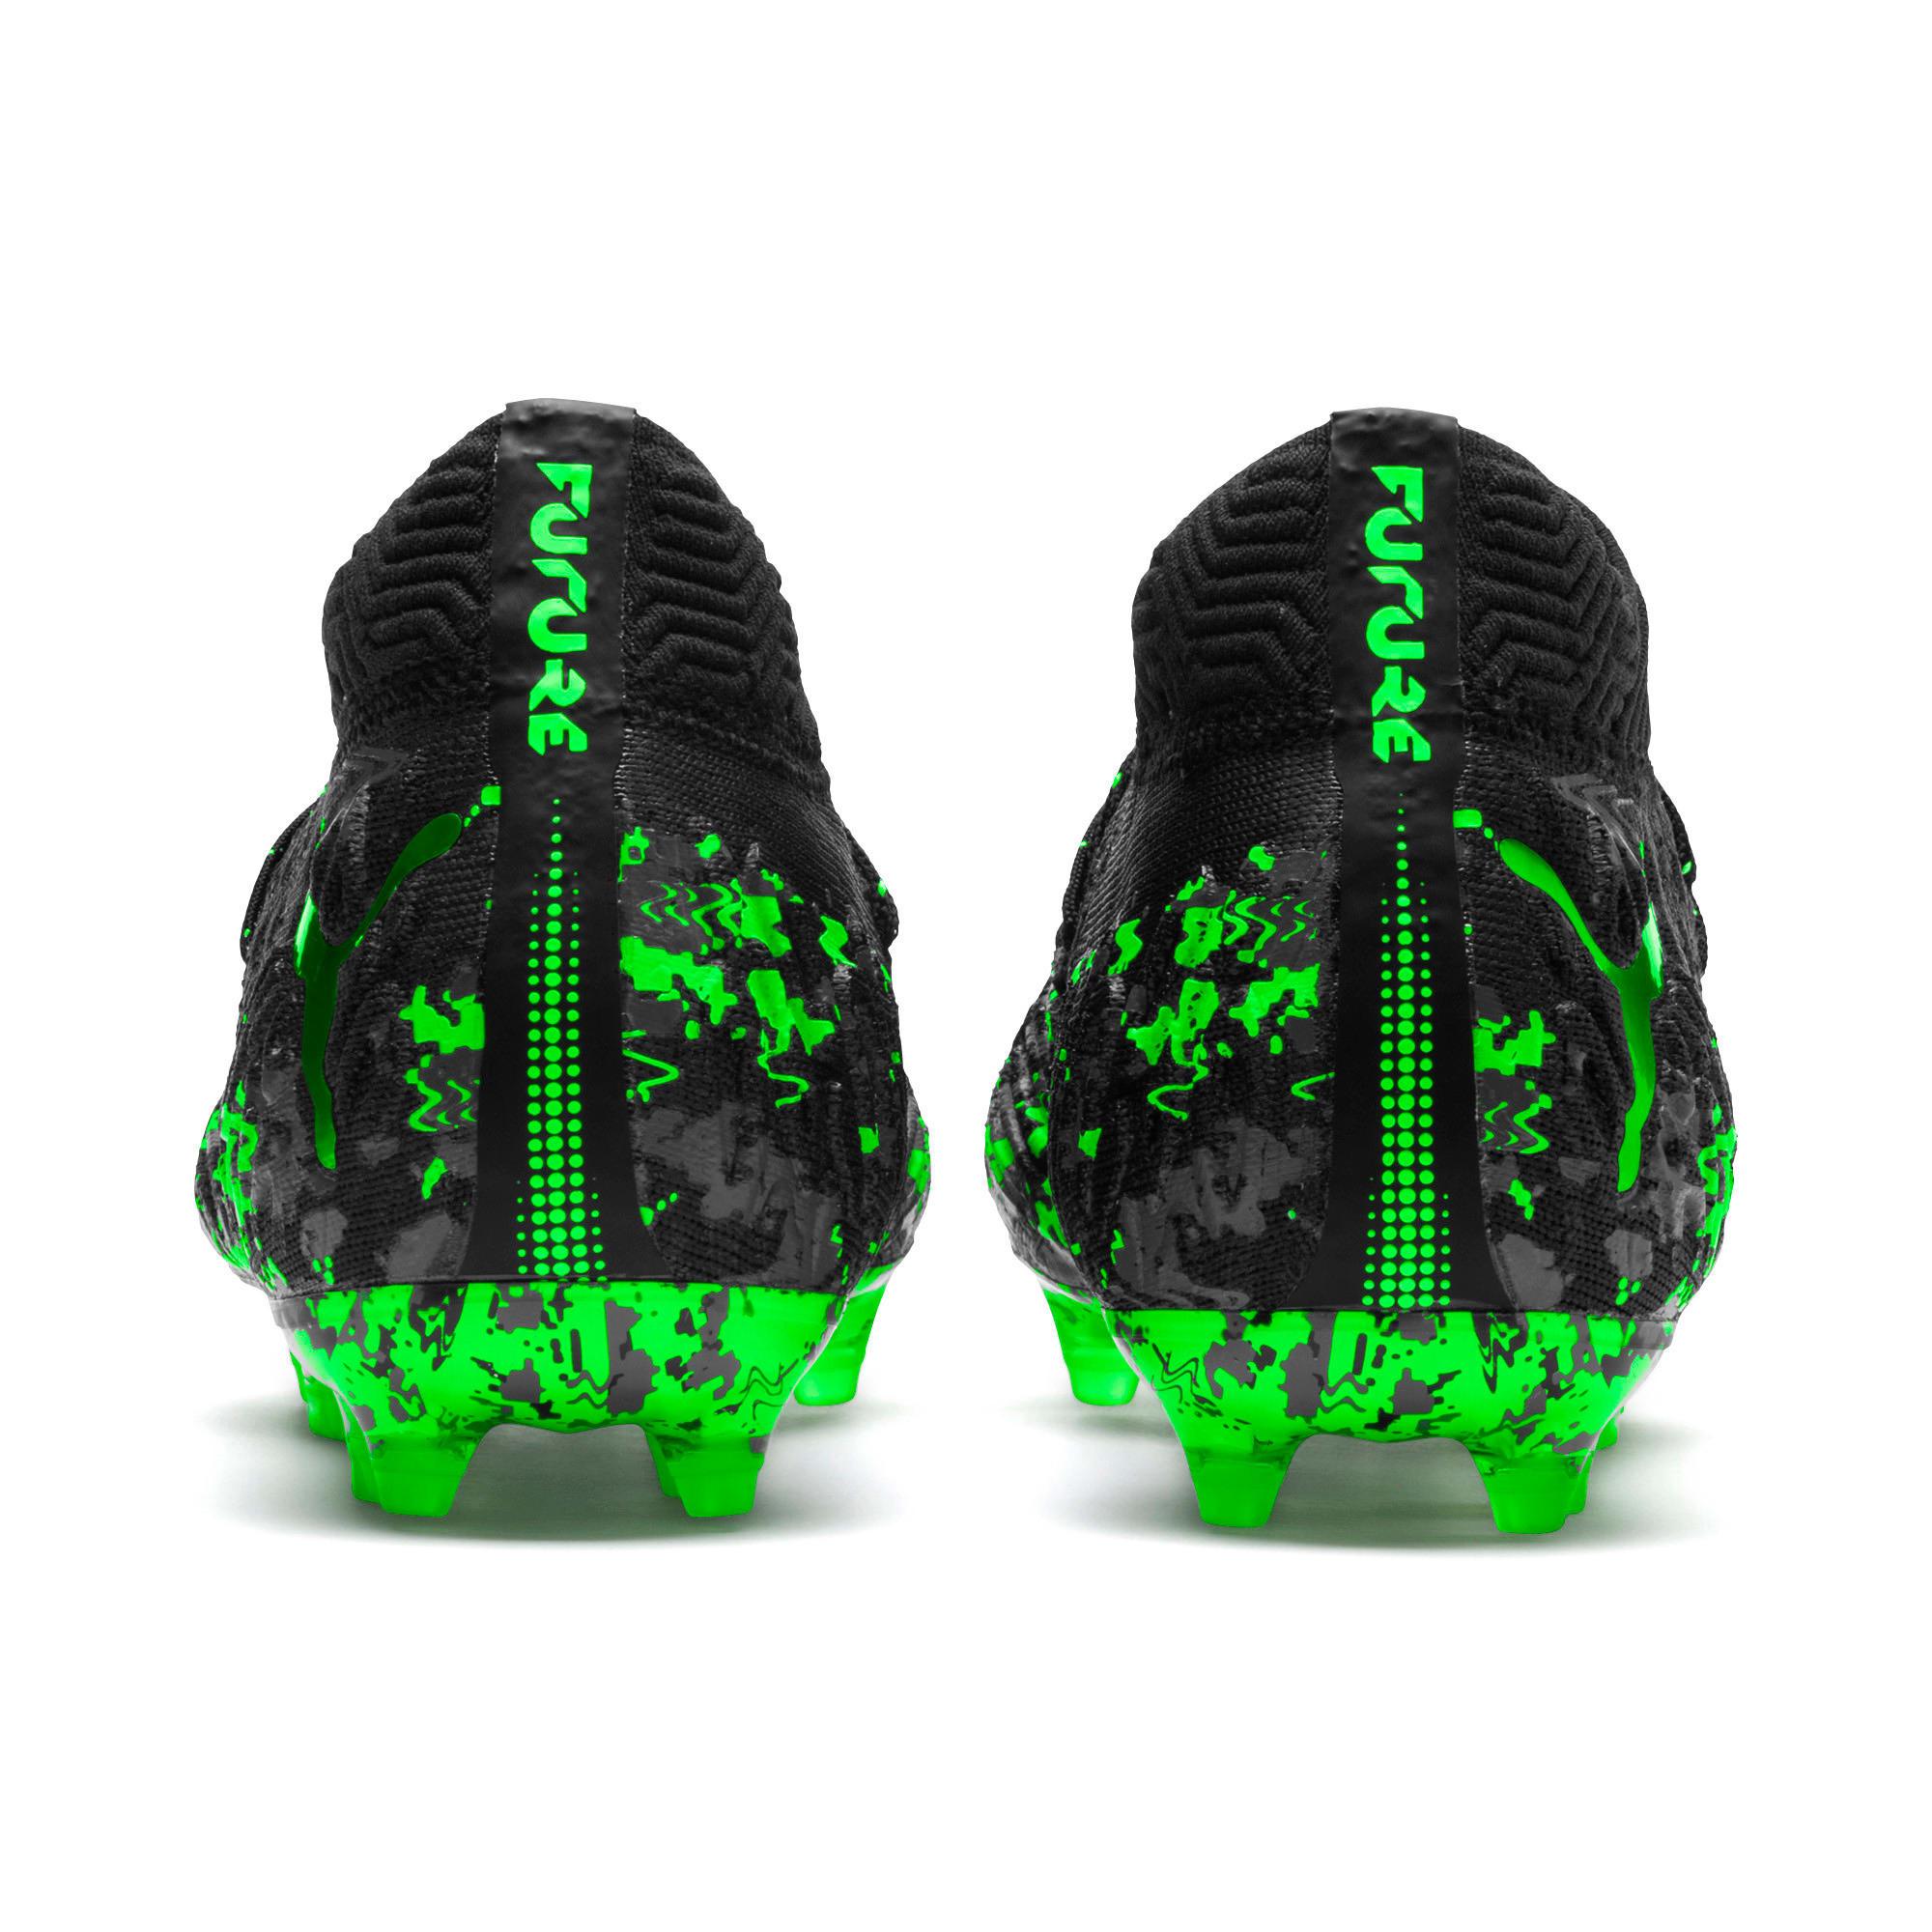 Thumbnail 3 of FUTURE 19.1 NETFIT FG/AG Kinder Fußballschuhe, Black-Gray-Green Gecko, medium